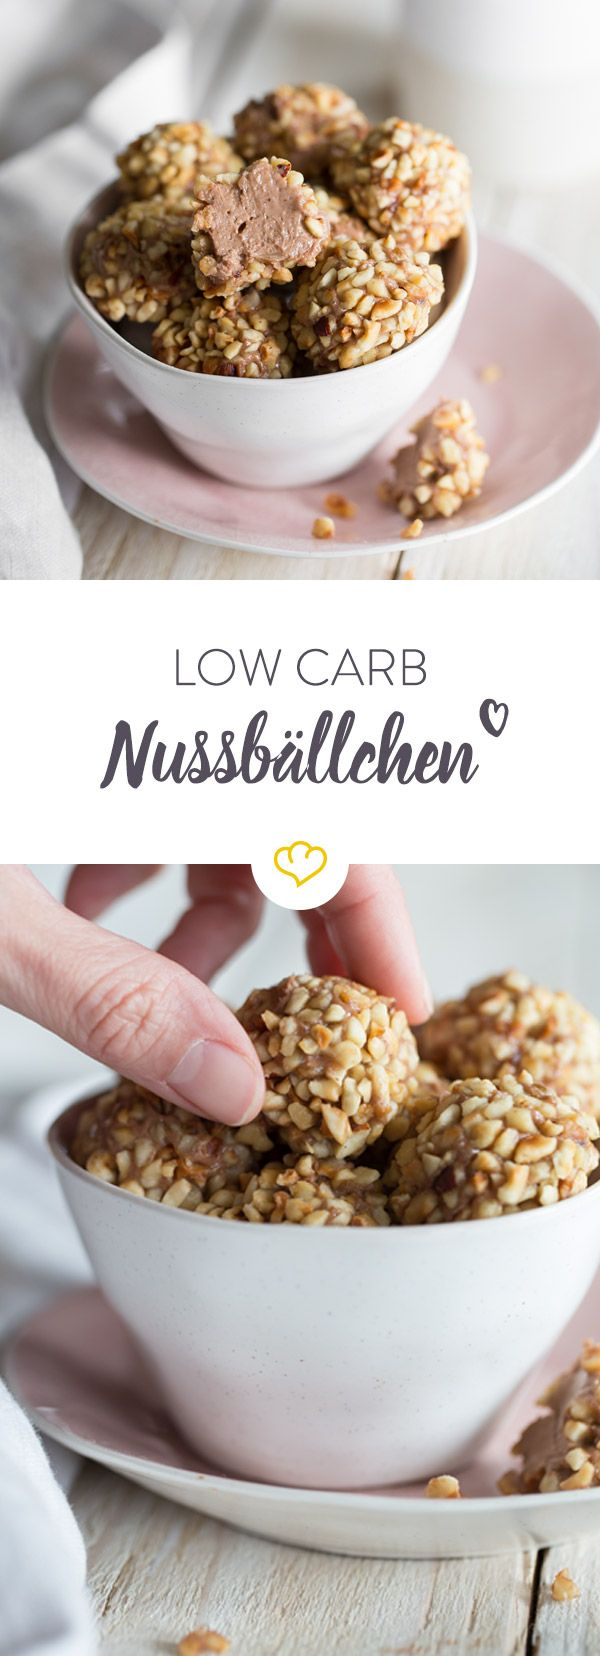 Low-Carb-Nussbällchen – erst rollen, dann snacken #sweetrecipes